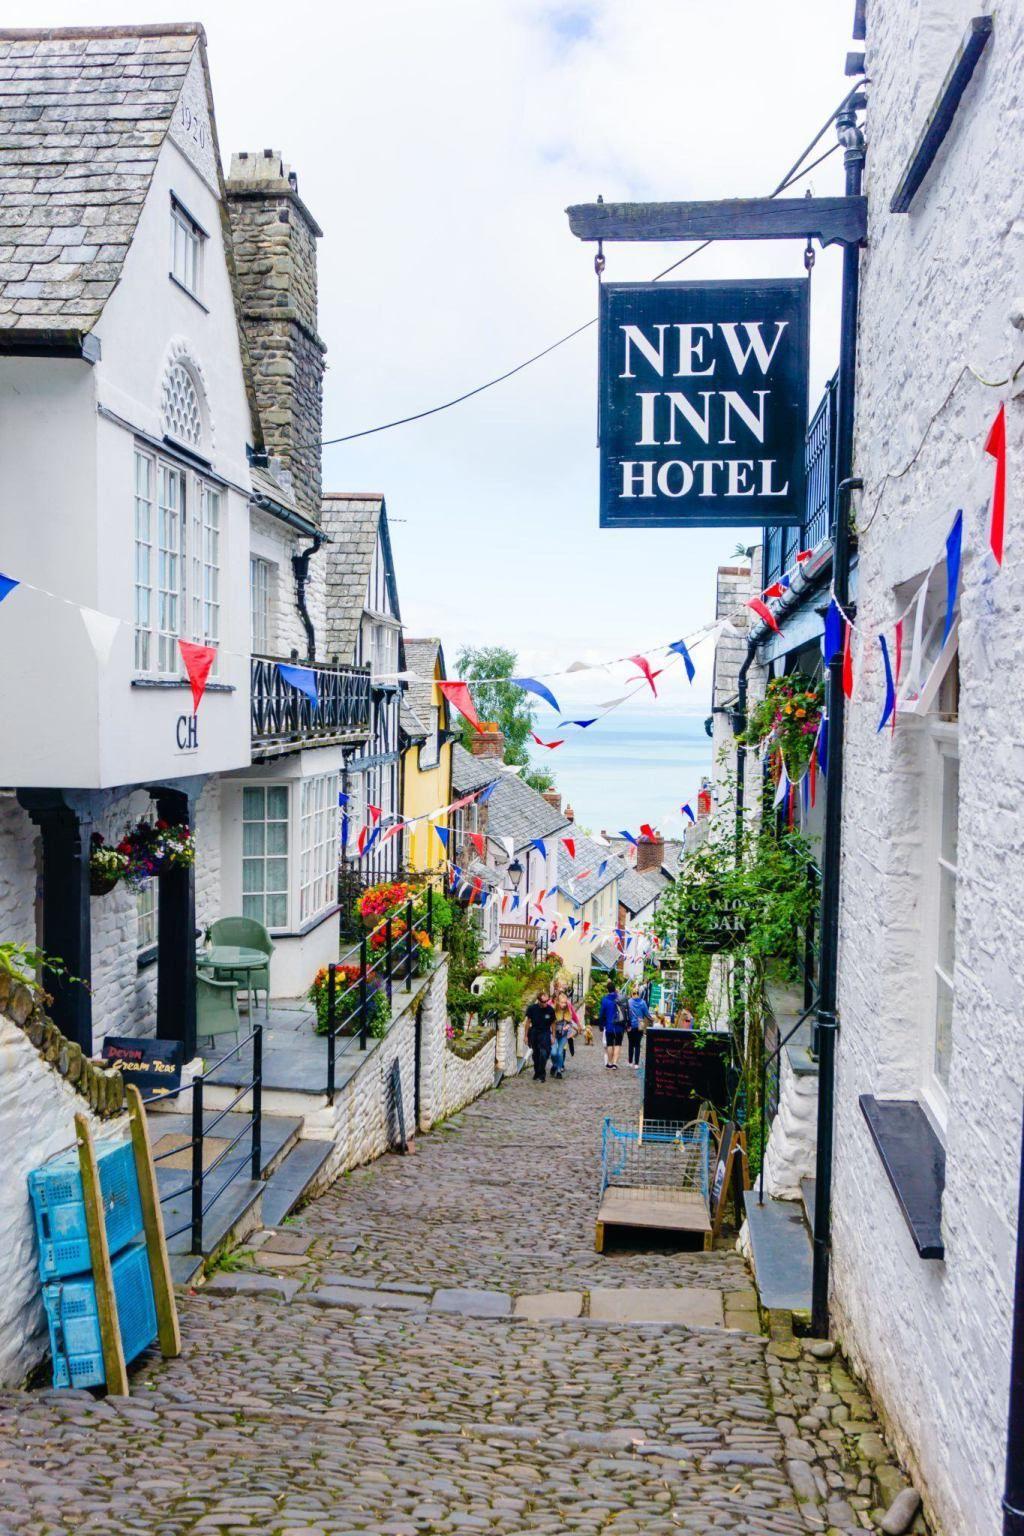 I paid to visit Clovelly, the prettiest village in Devon. Was it ...